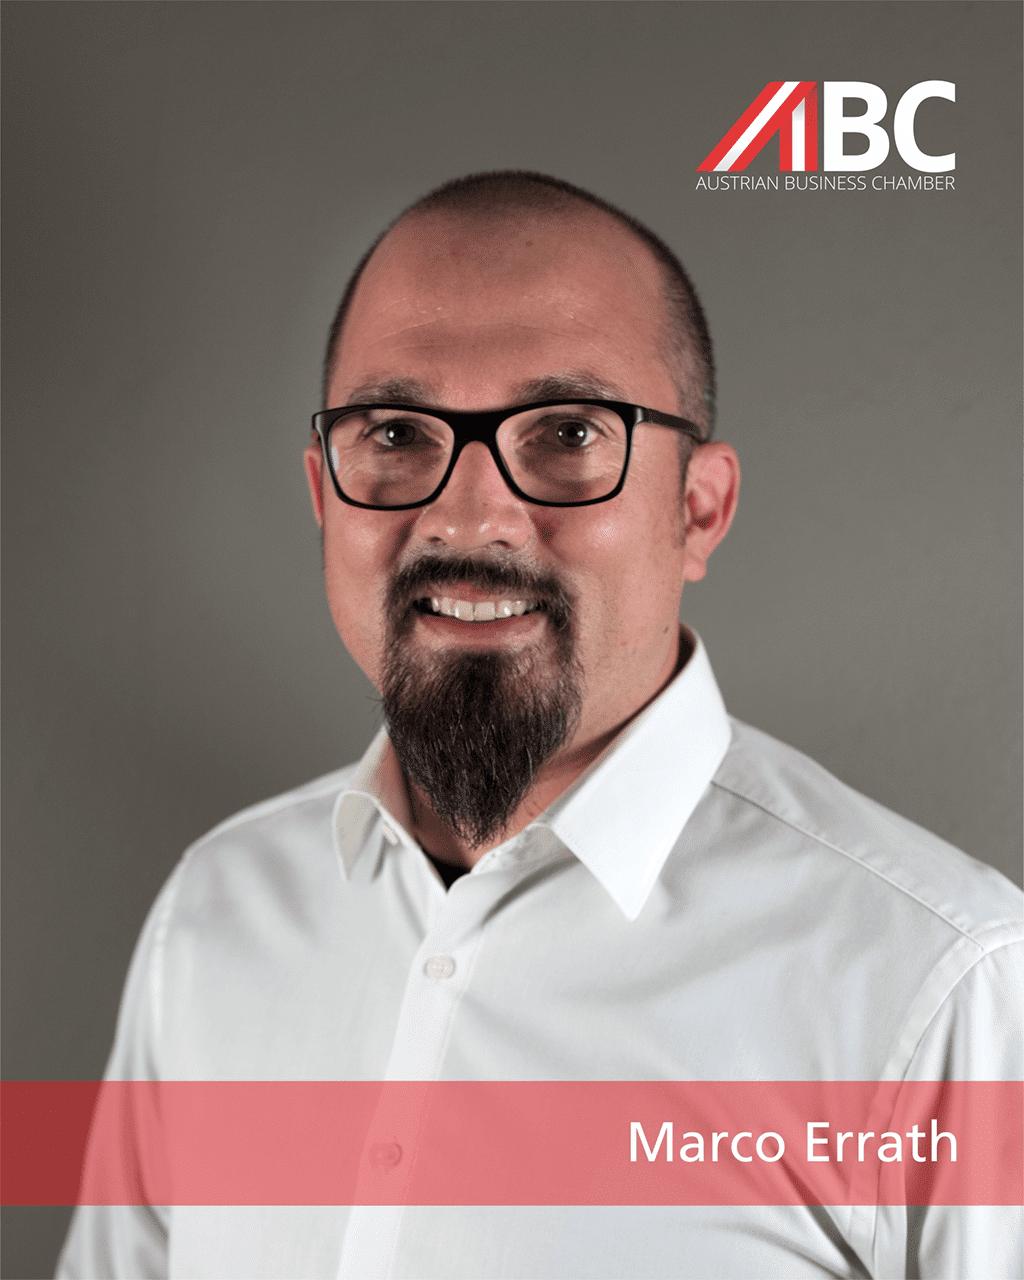 Marco Errath